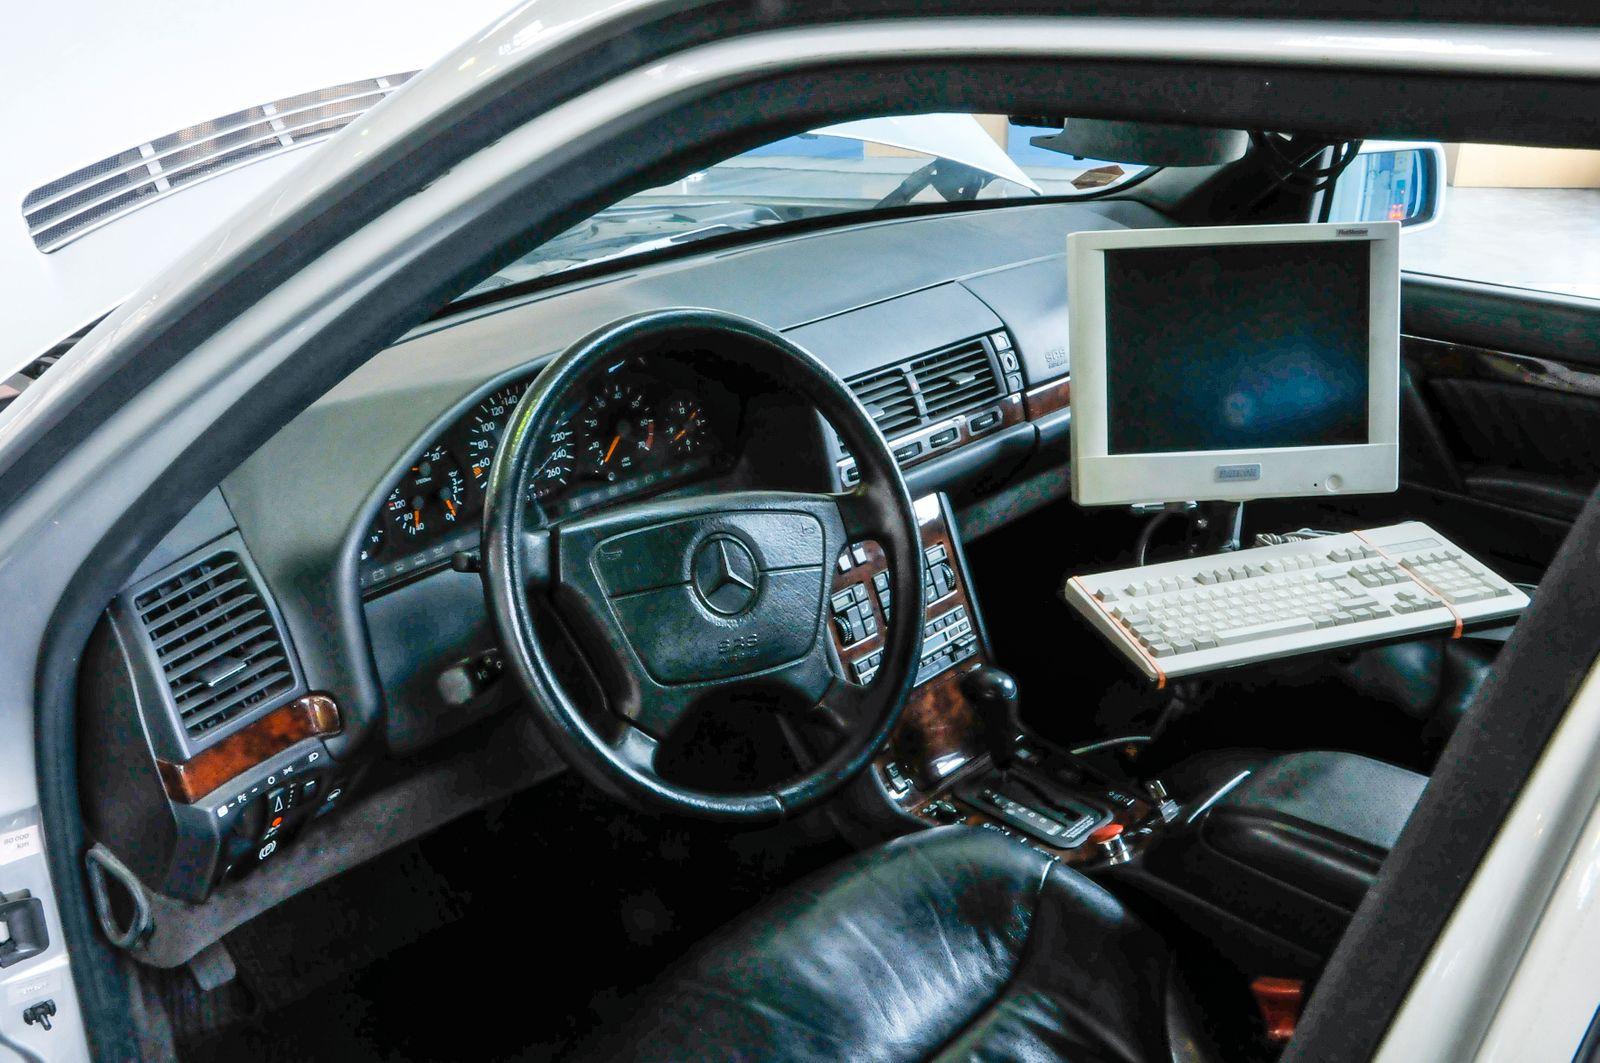 Mercedes S-Klasse W140 / S-Klasse (Baureihe 140) Prometheus VaMP / Vita2